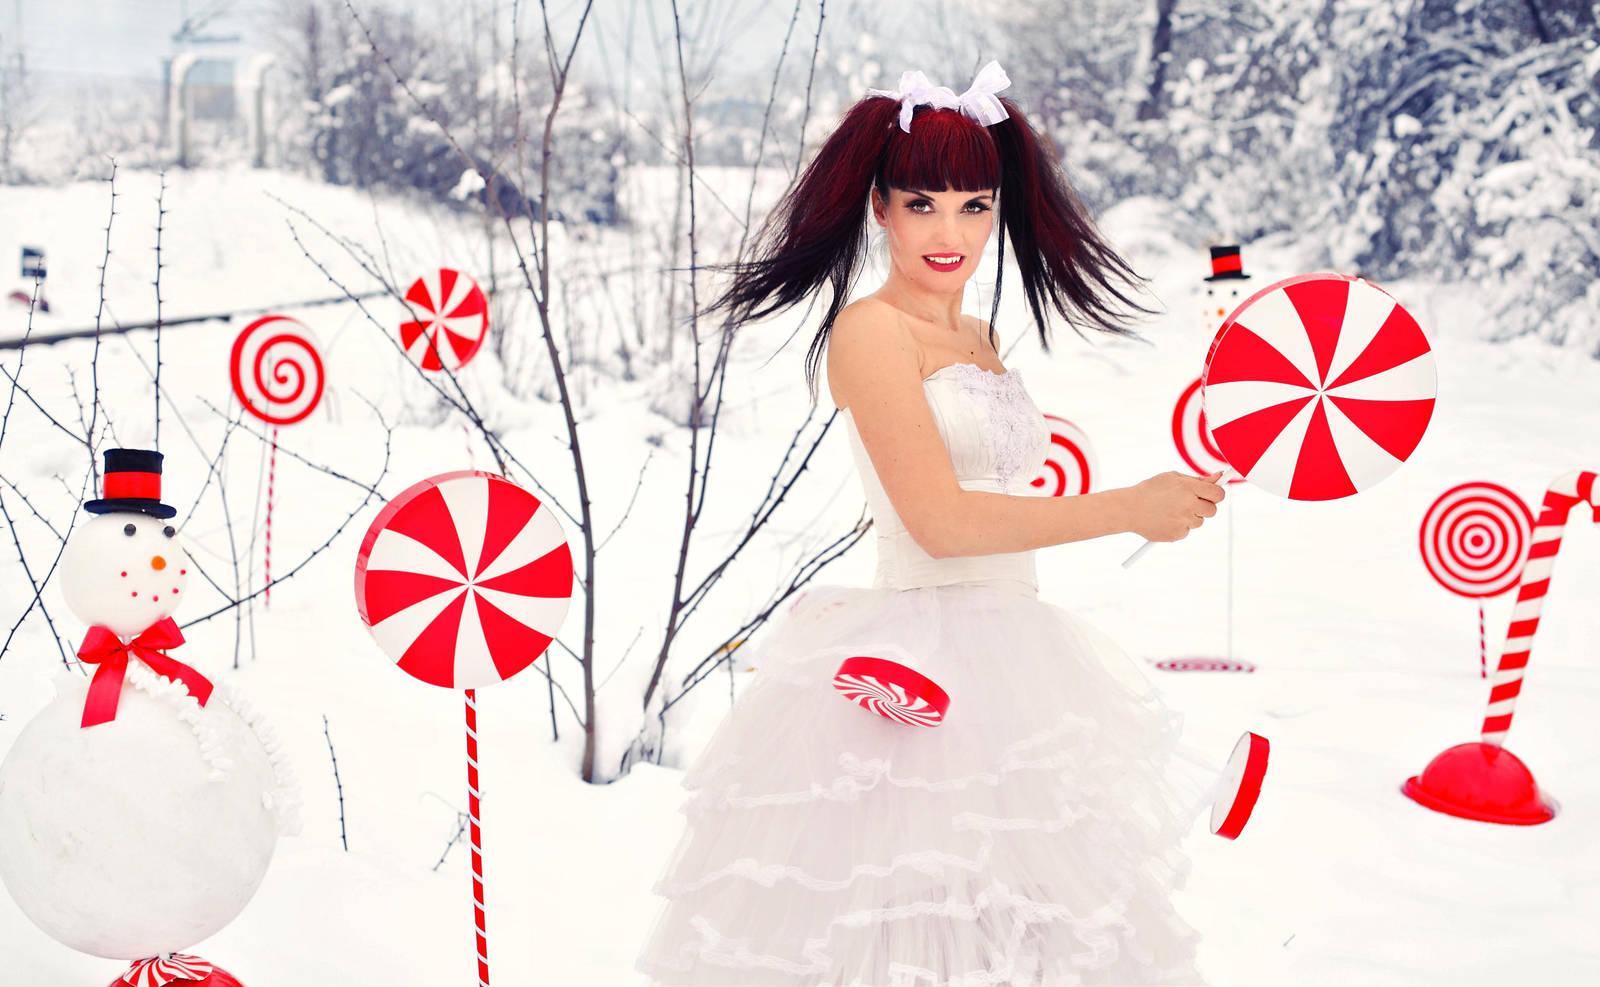 Lost in Wonderland by LadyOfTheShadow